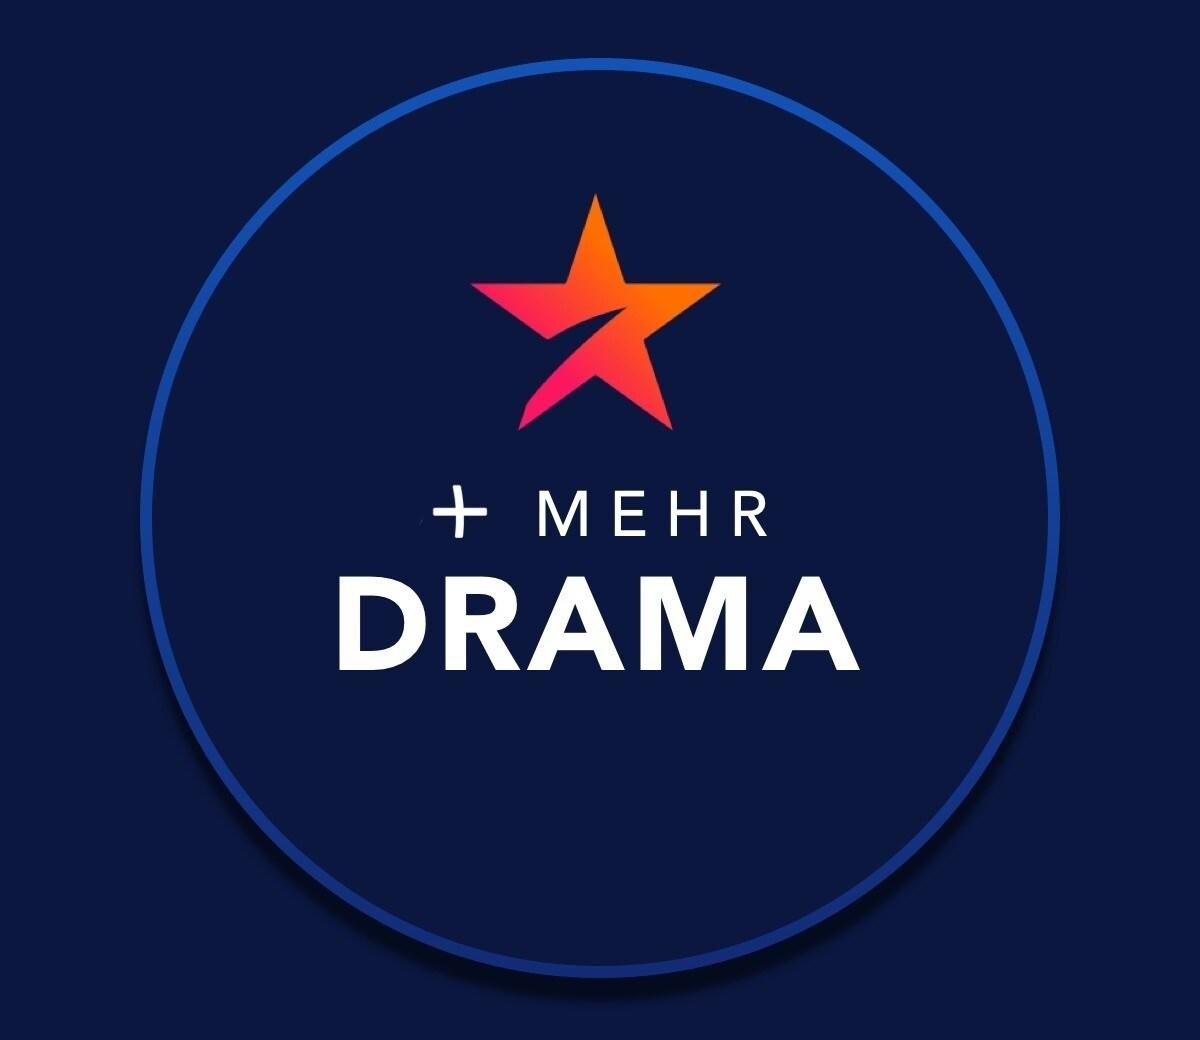 + Mehr Drama